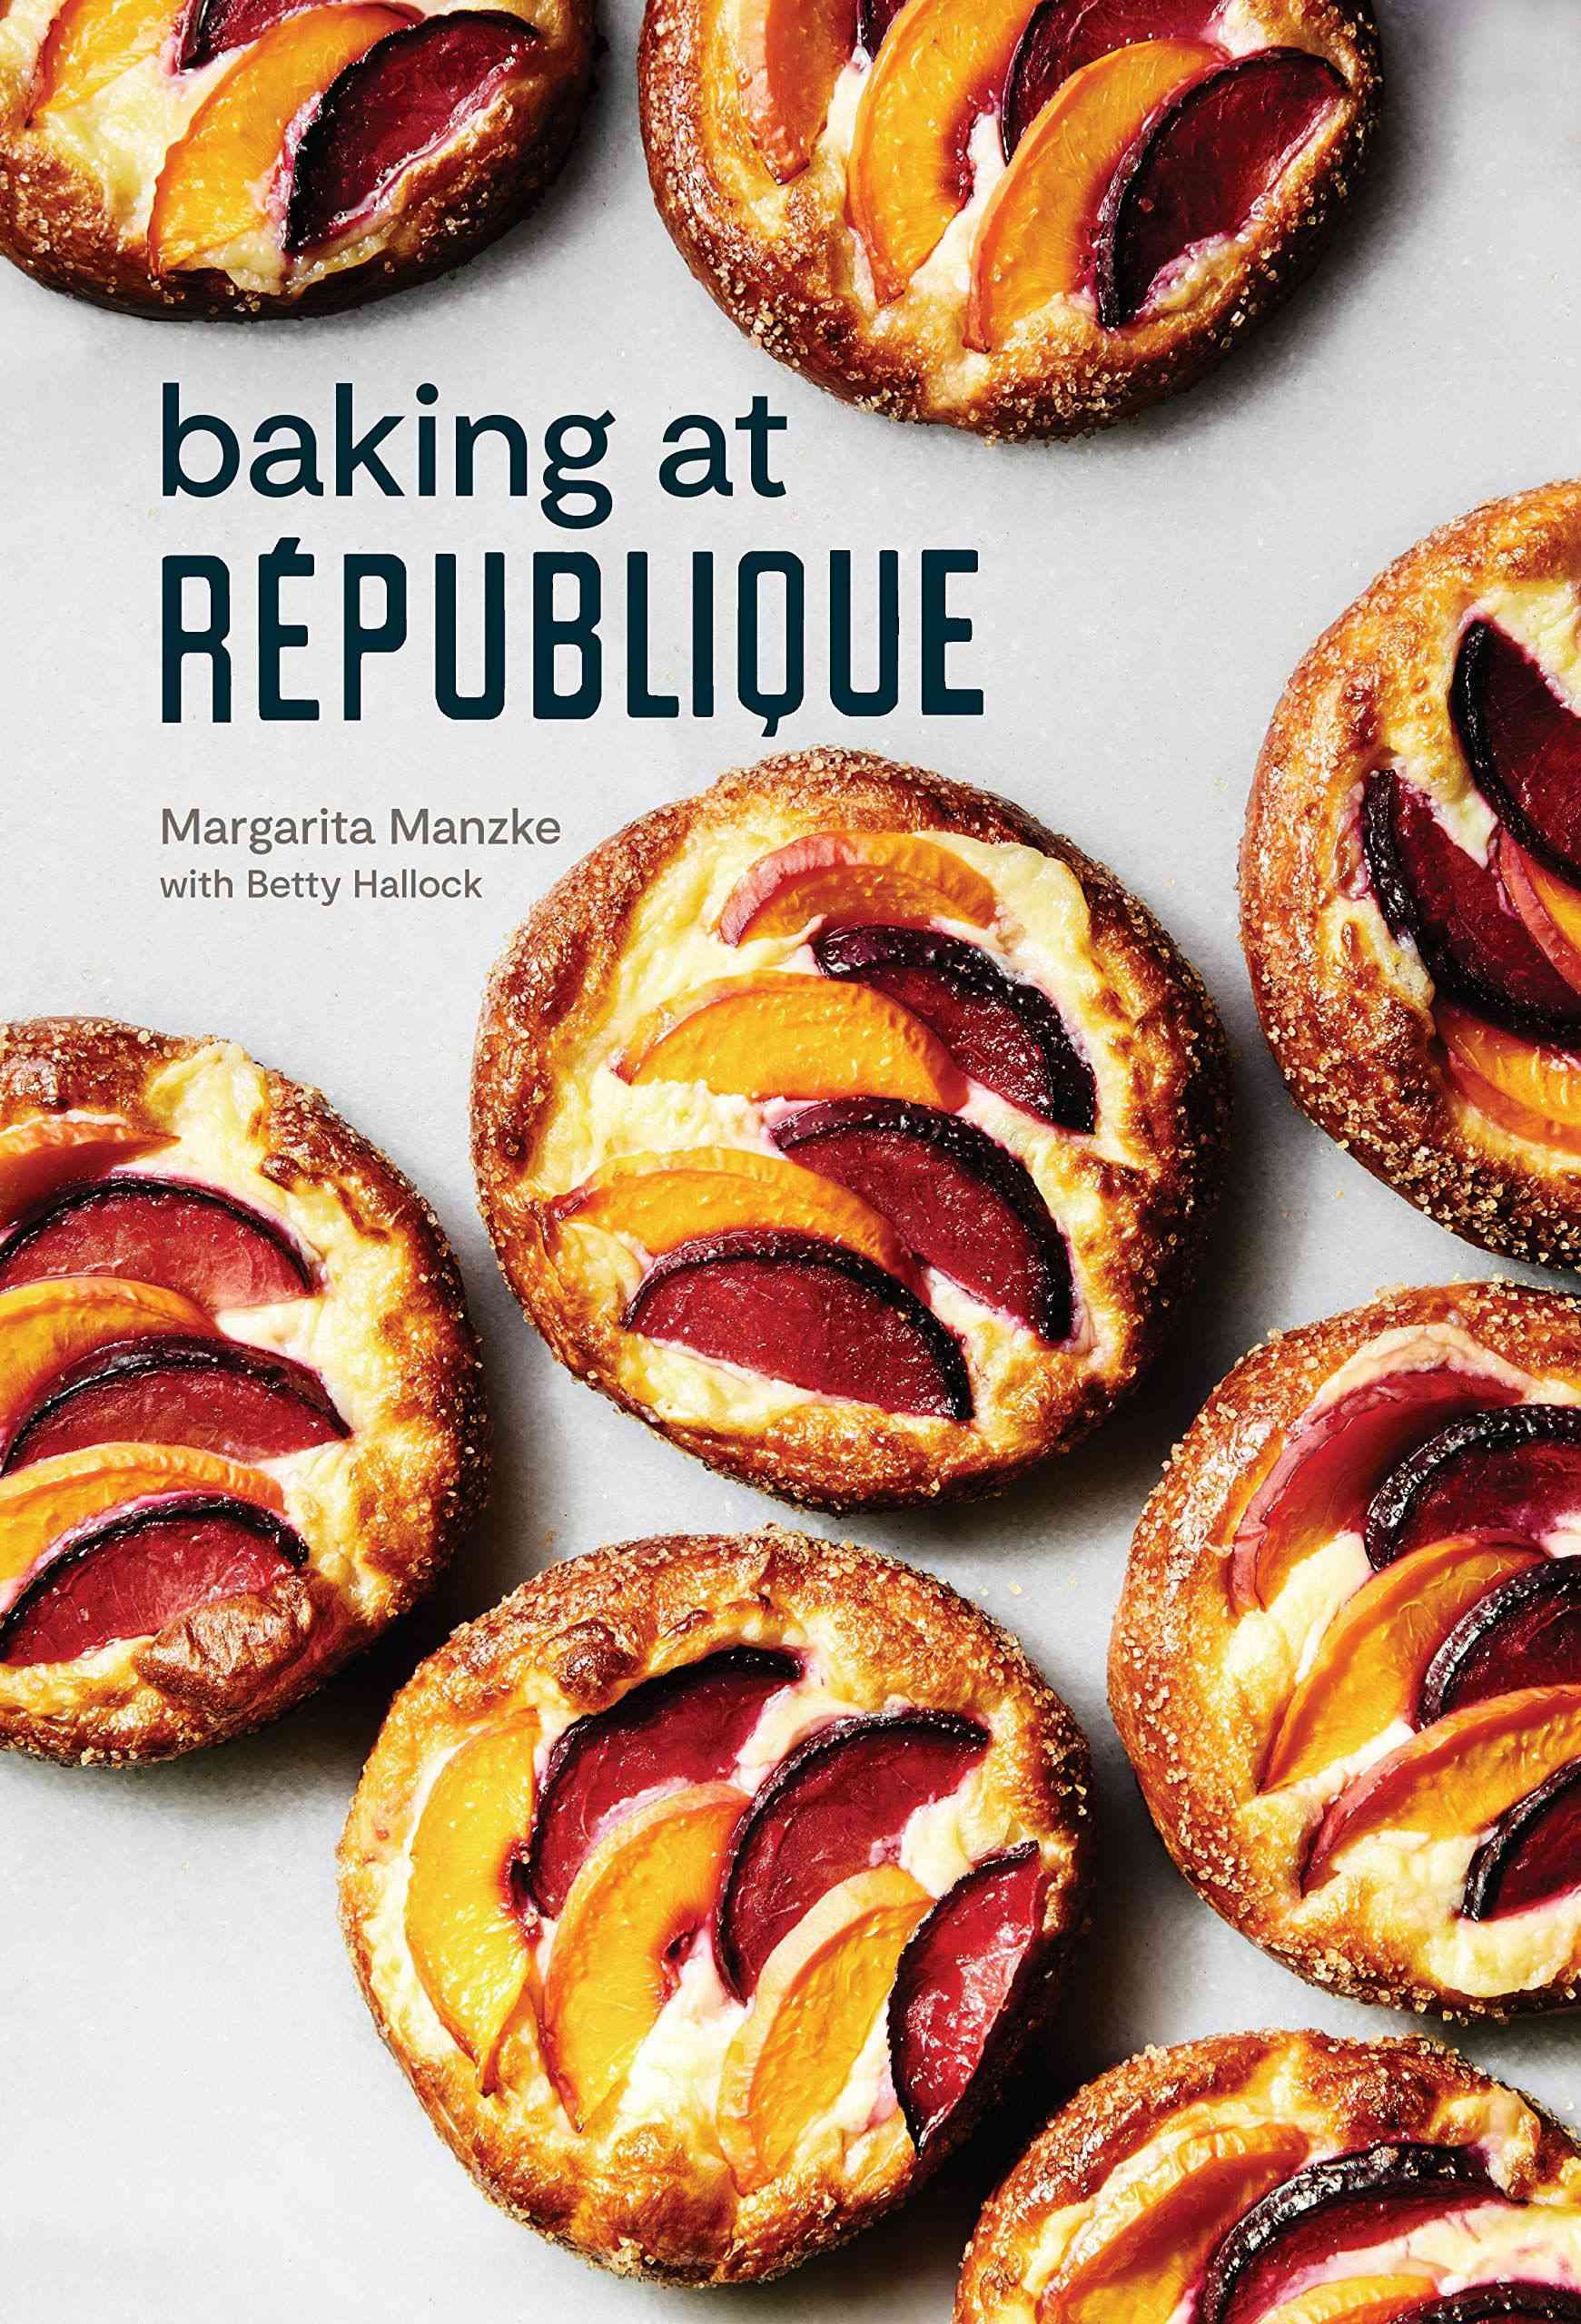 Baking at République by Margarita Manzke